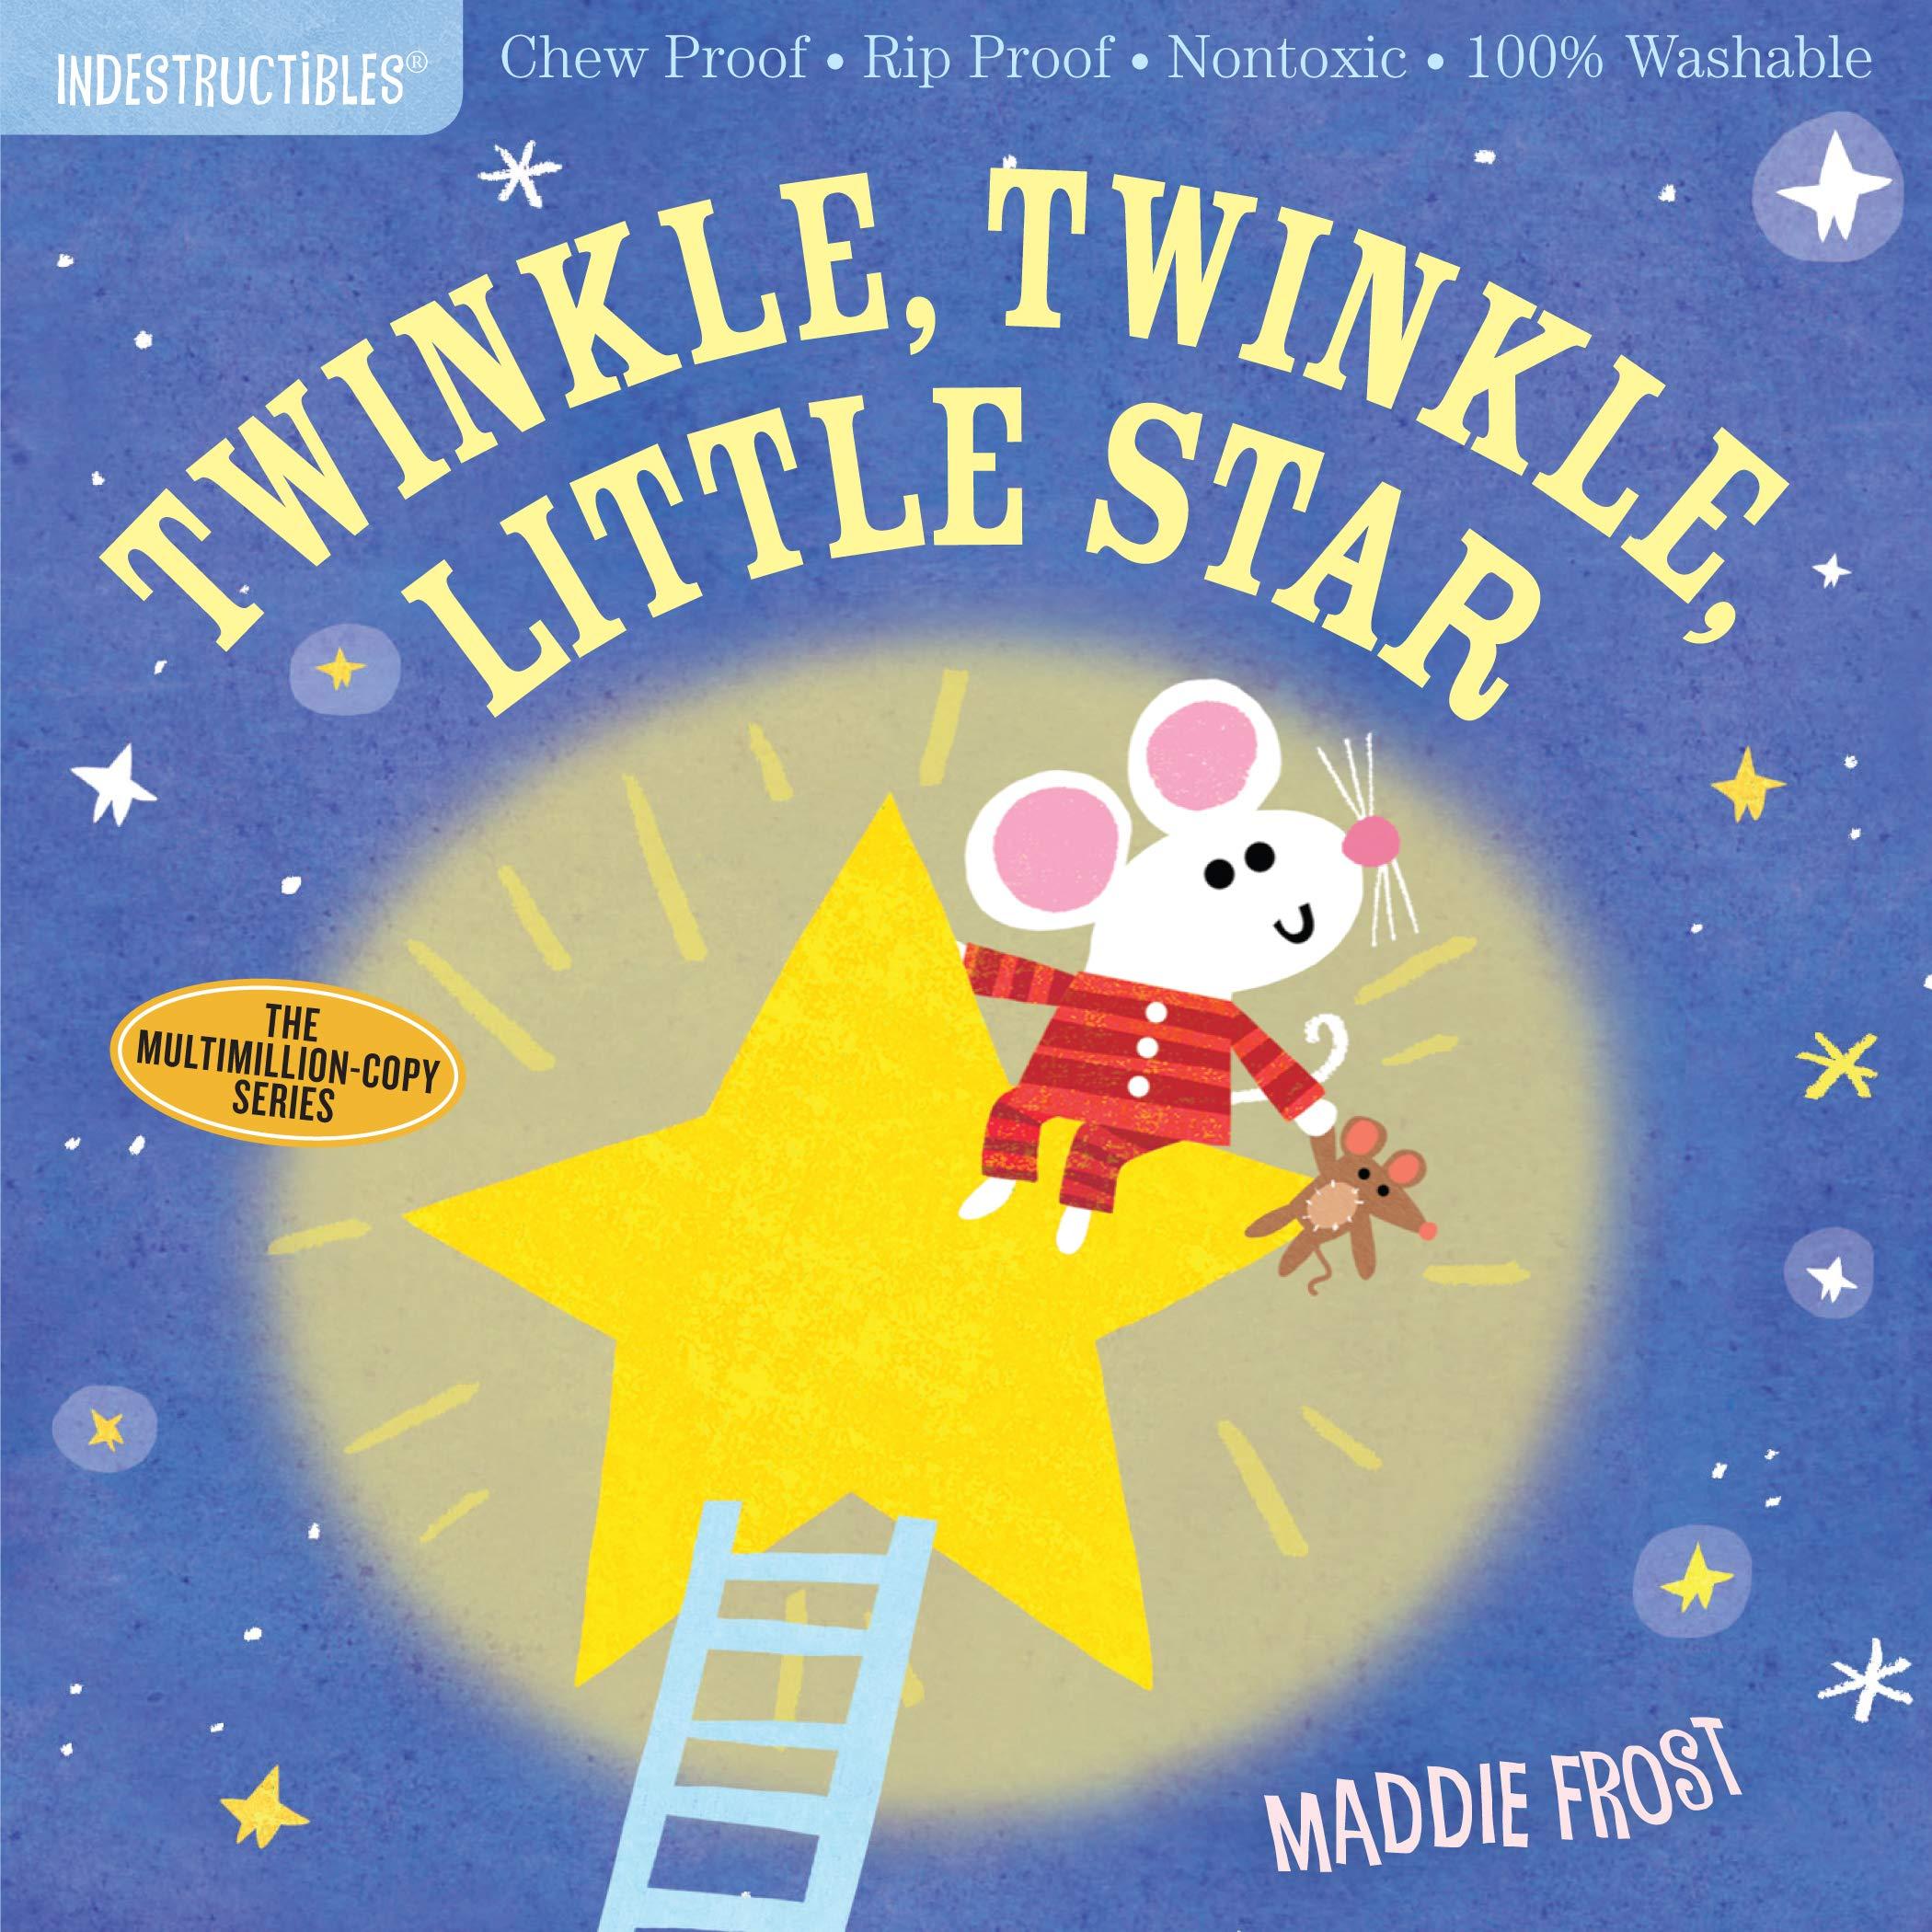 Top 10 Best indestructibles baby books